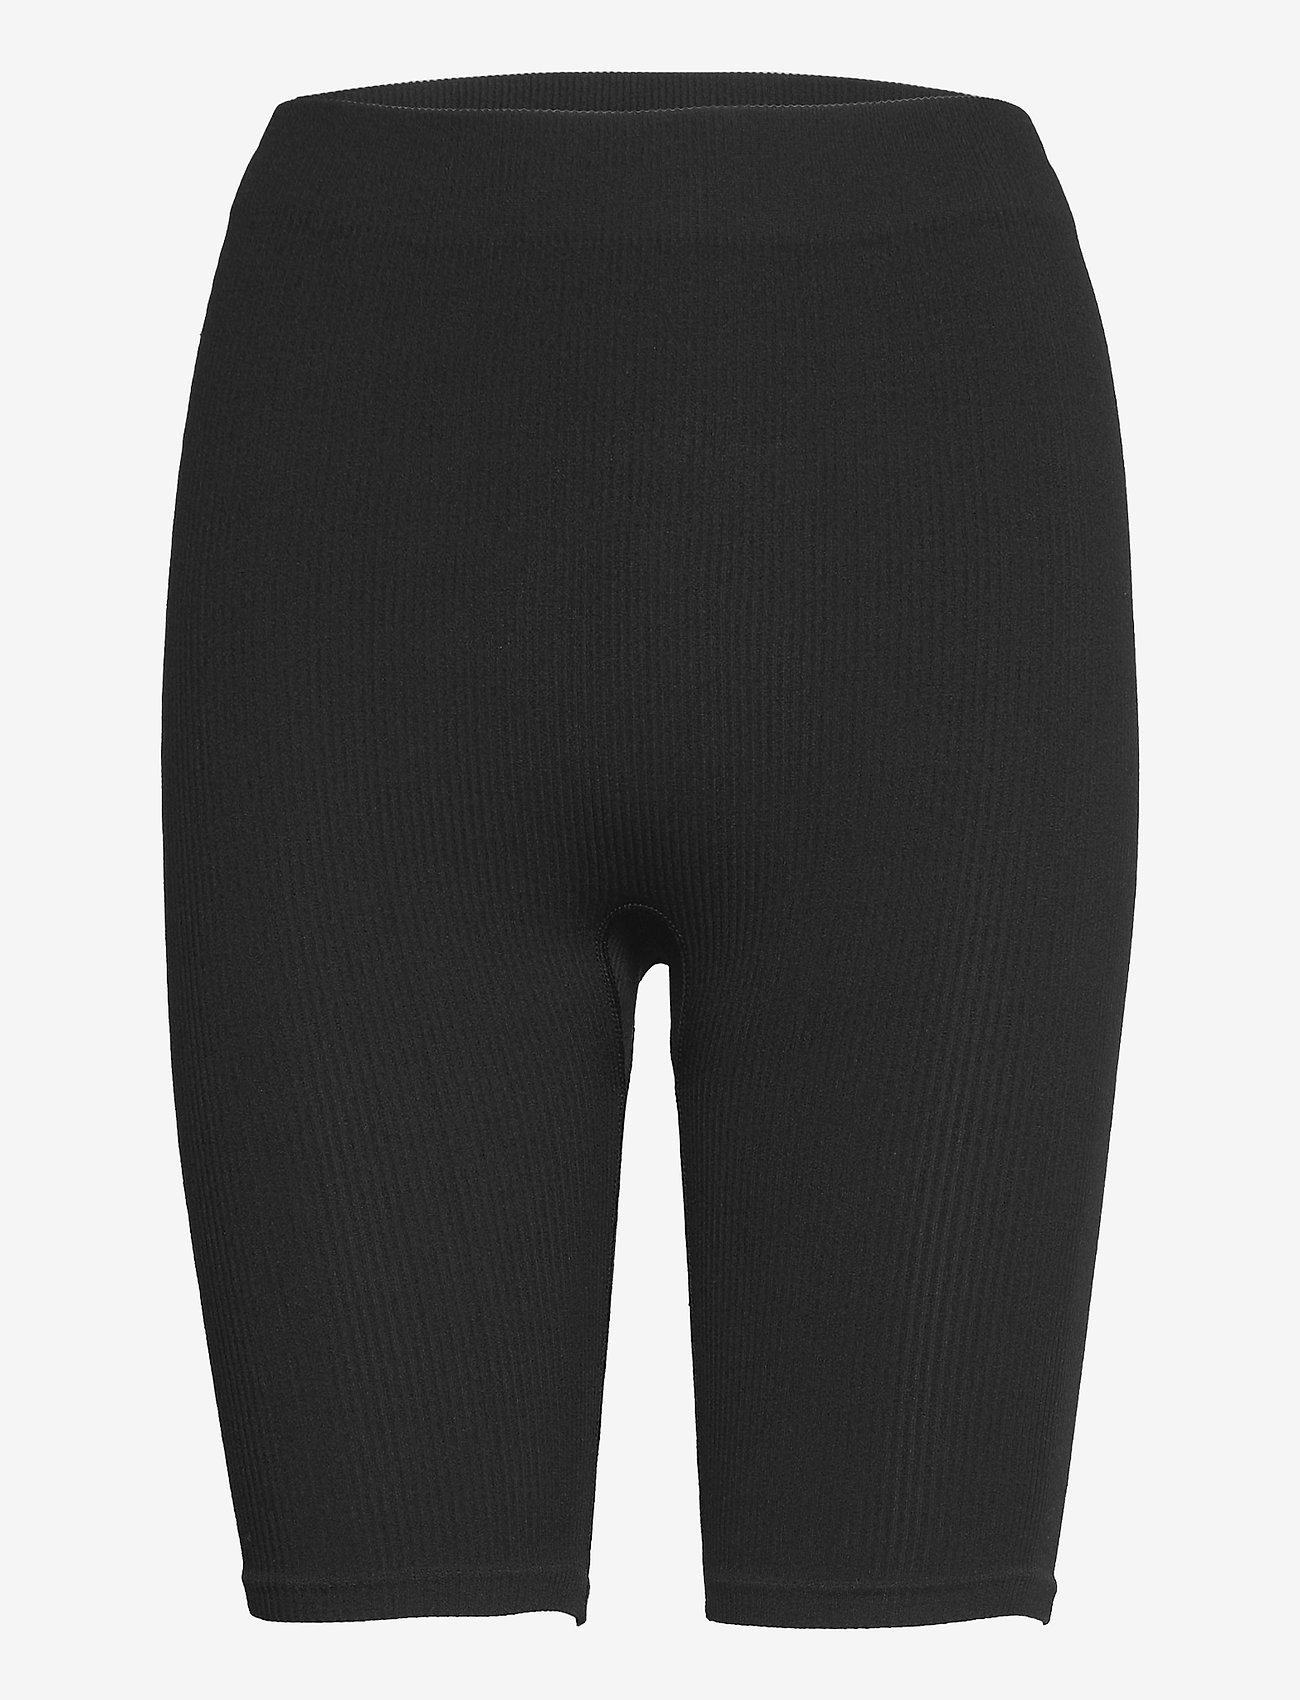 Vero Moda - VMEVE SHORTS - cycling shorts - black - 0